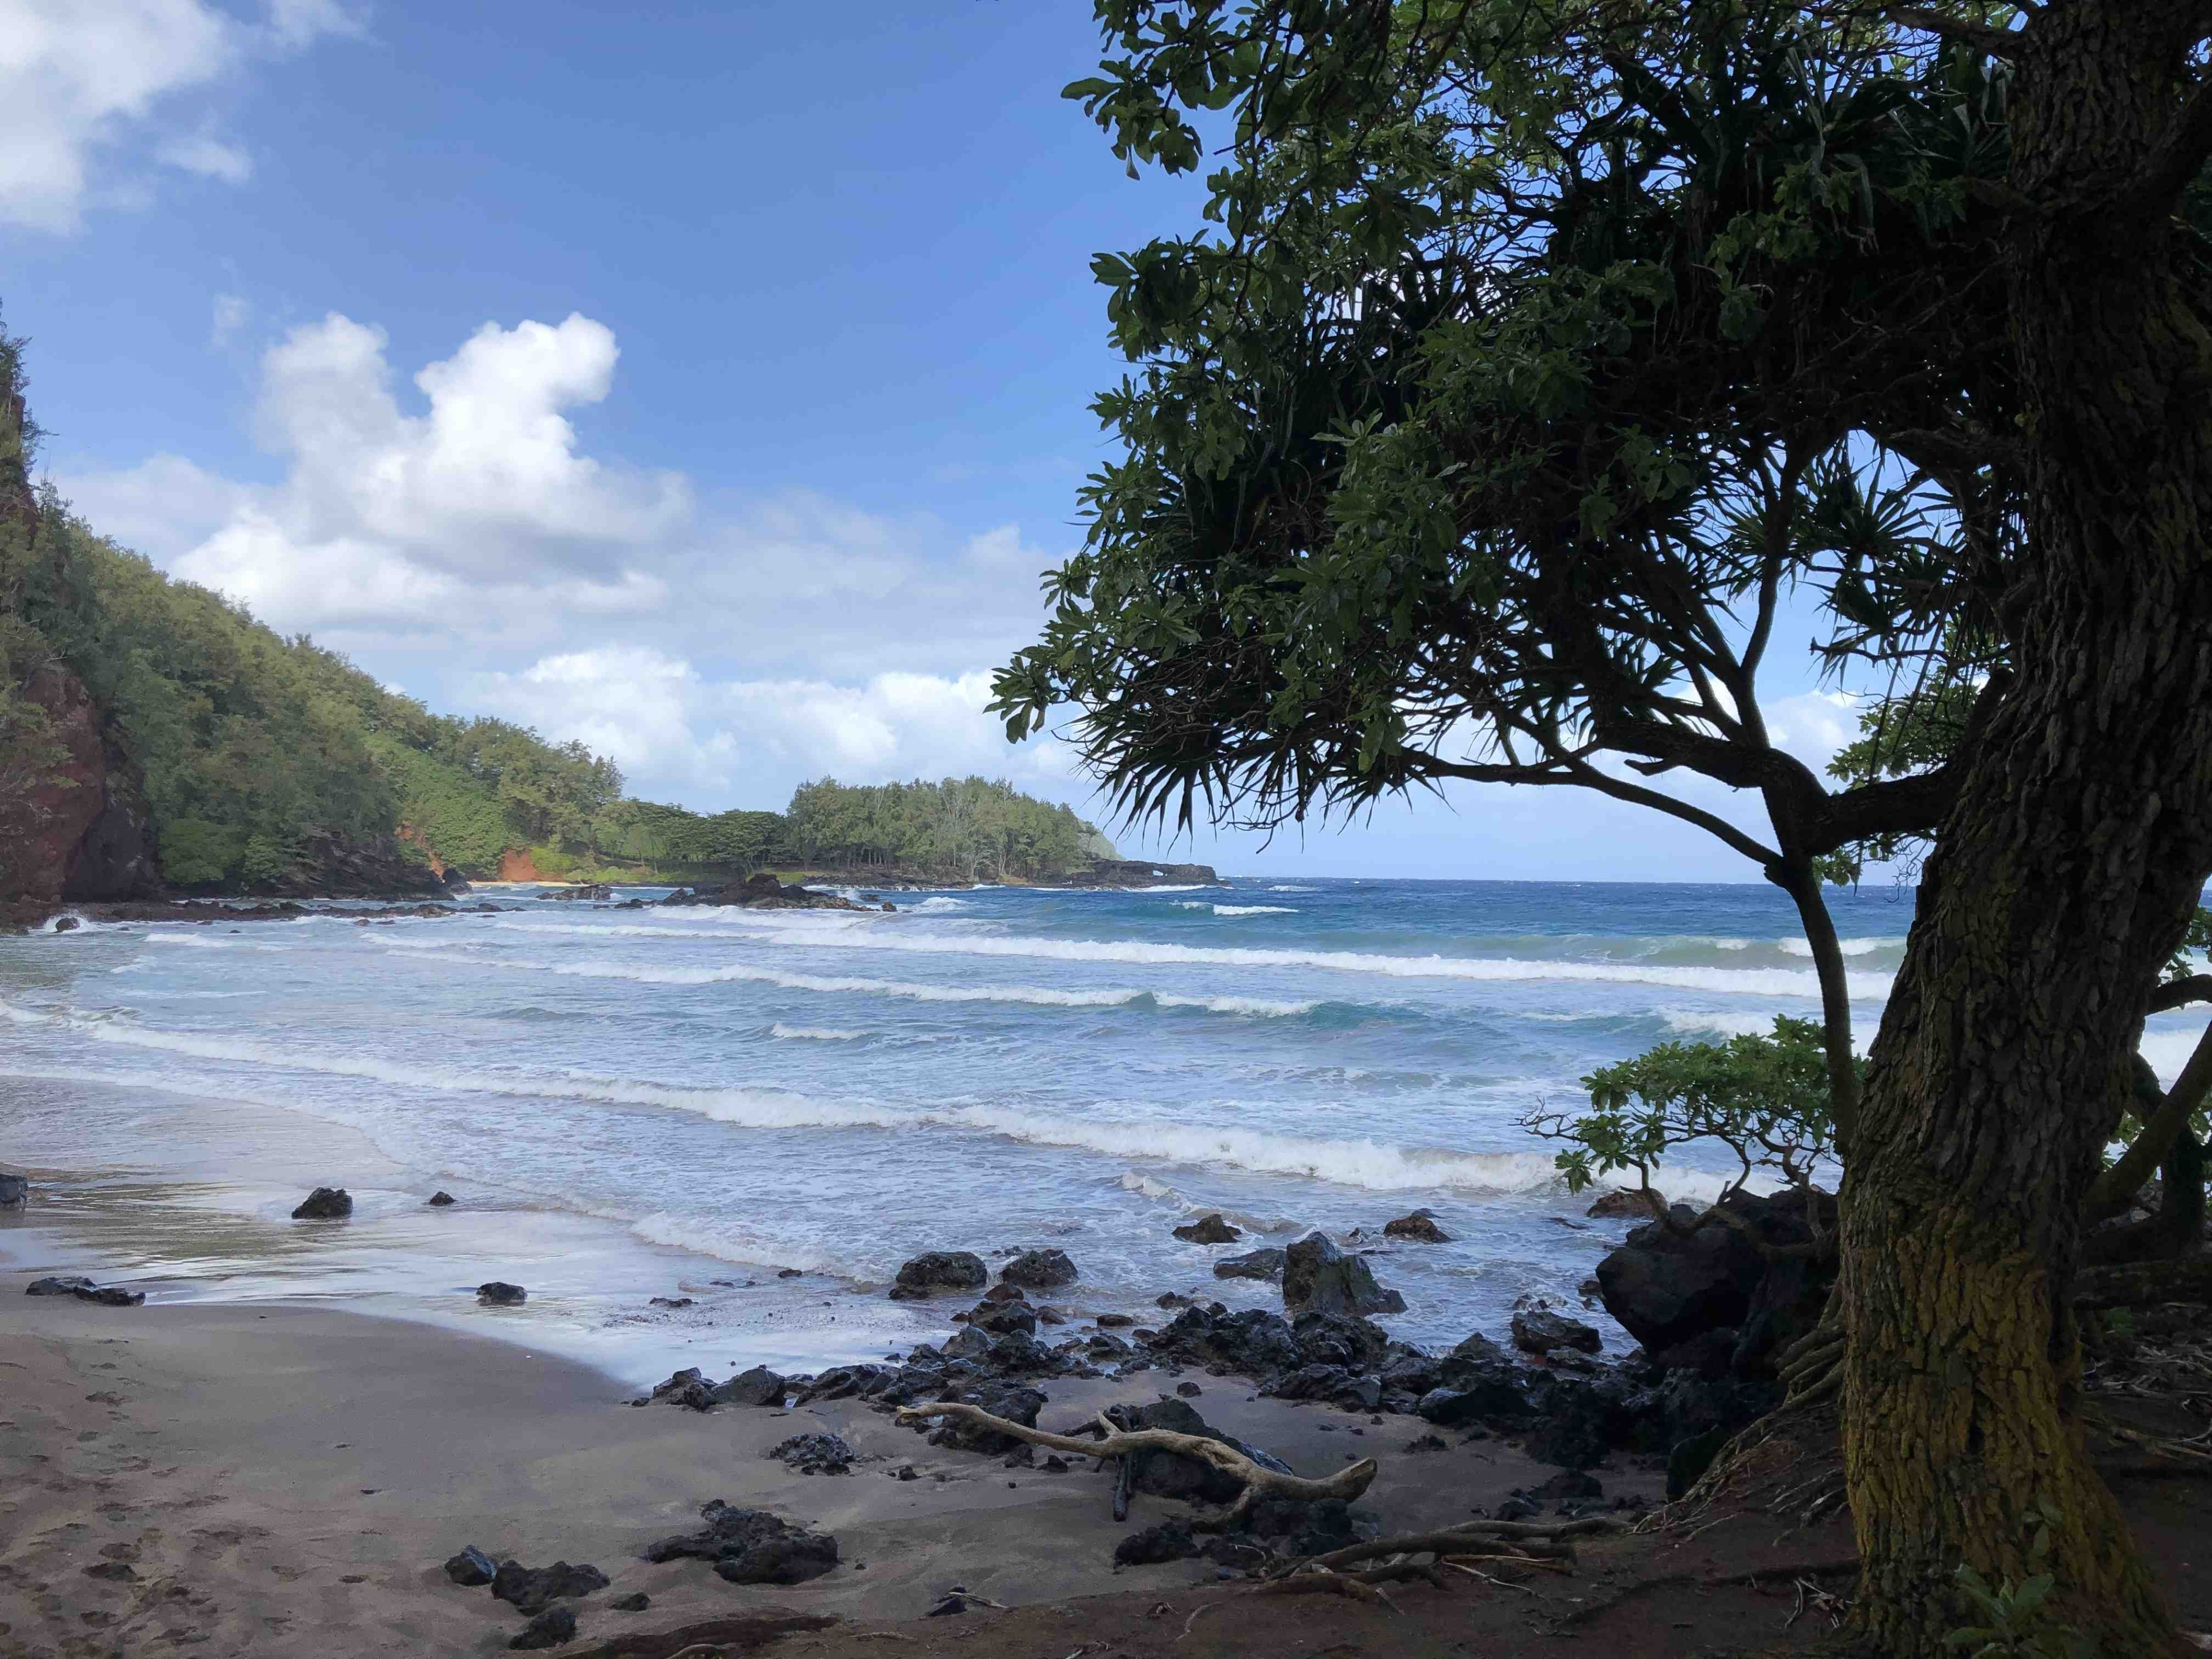 Koki Beach Park, Hāna, Hawaii, USA